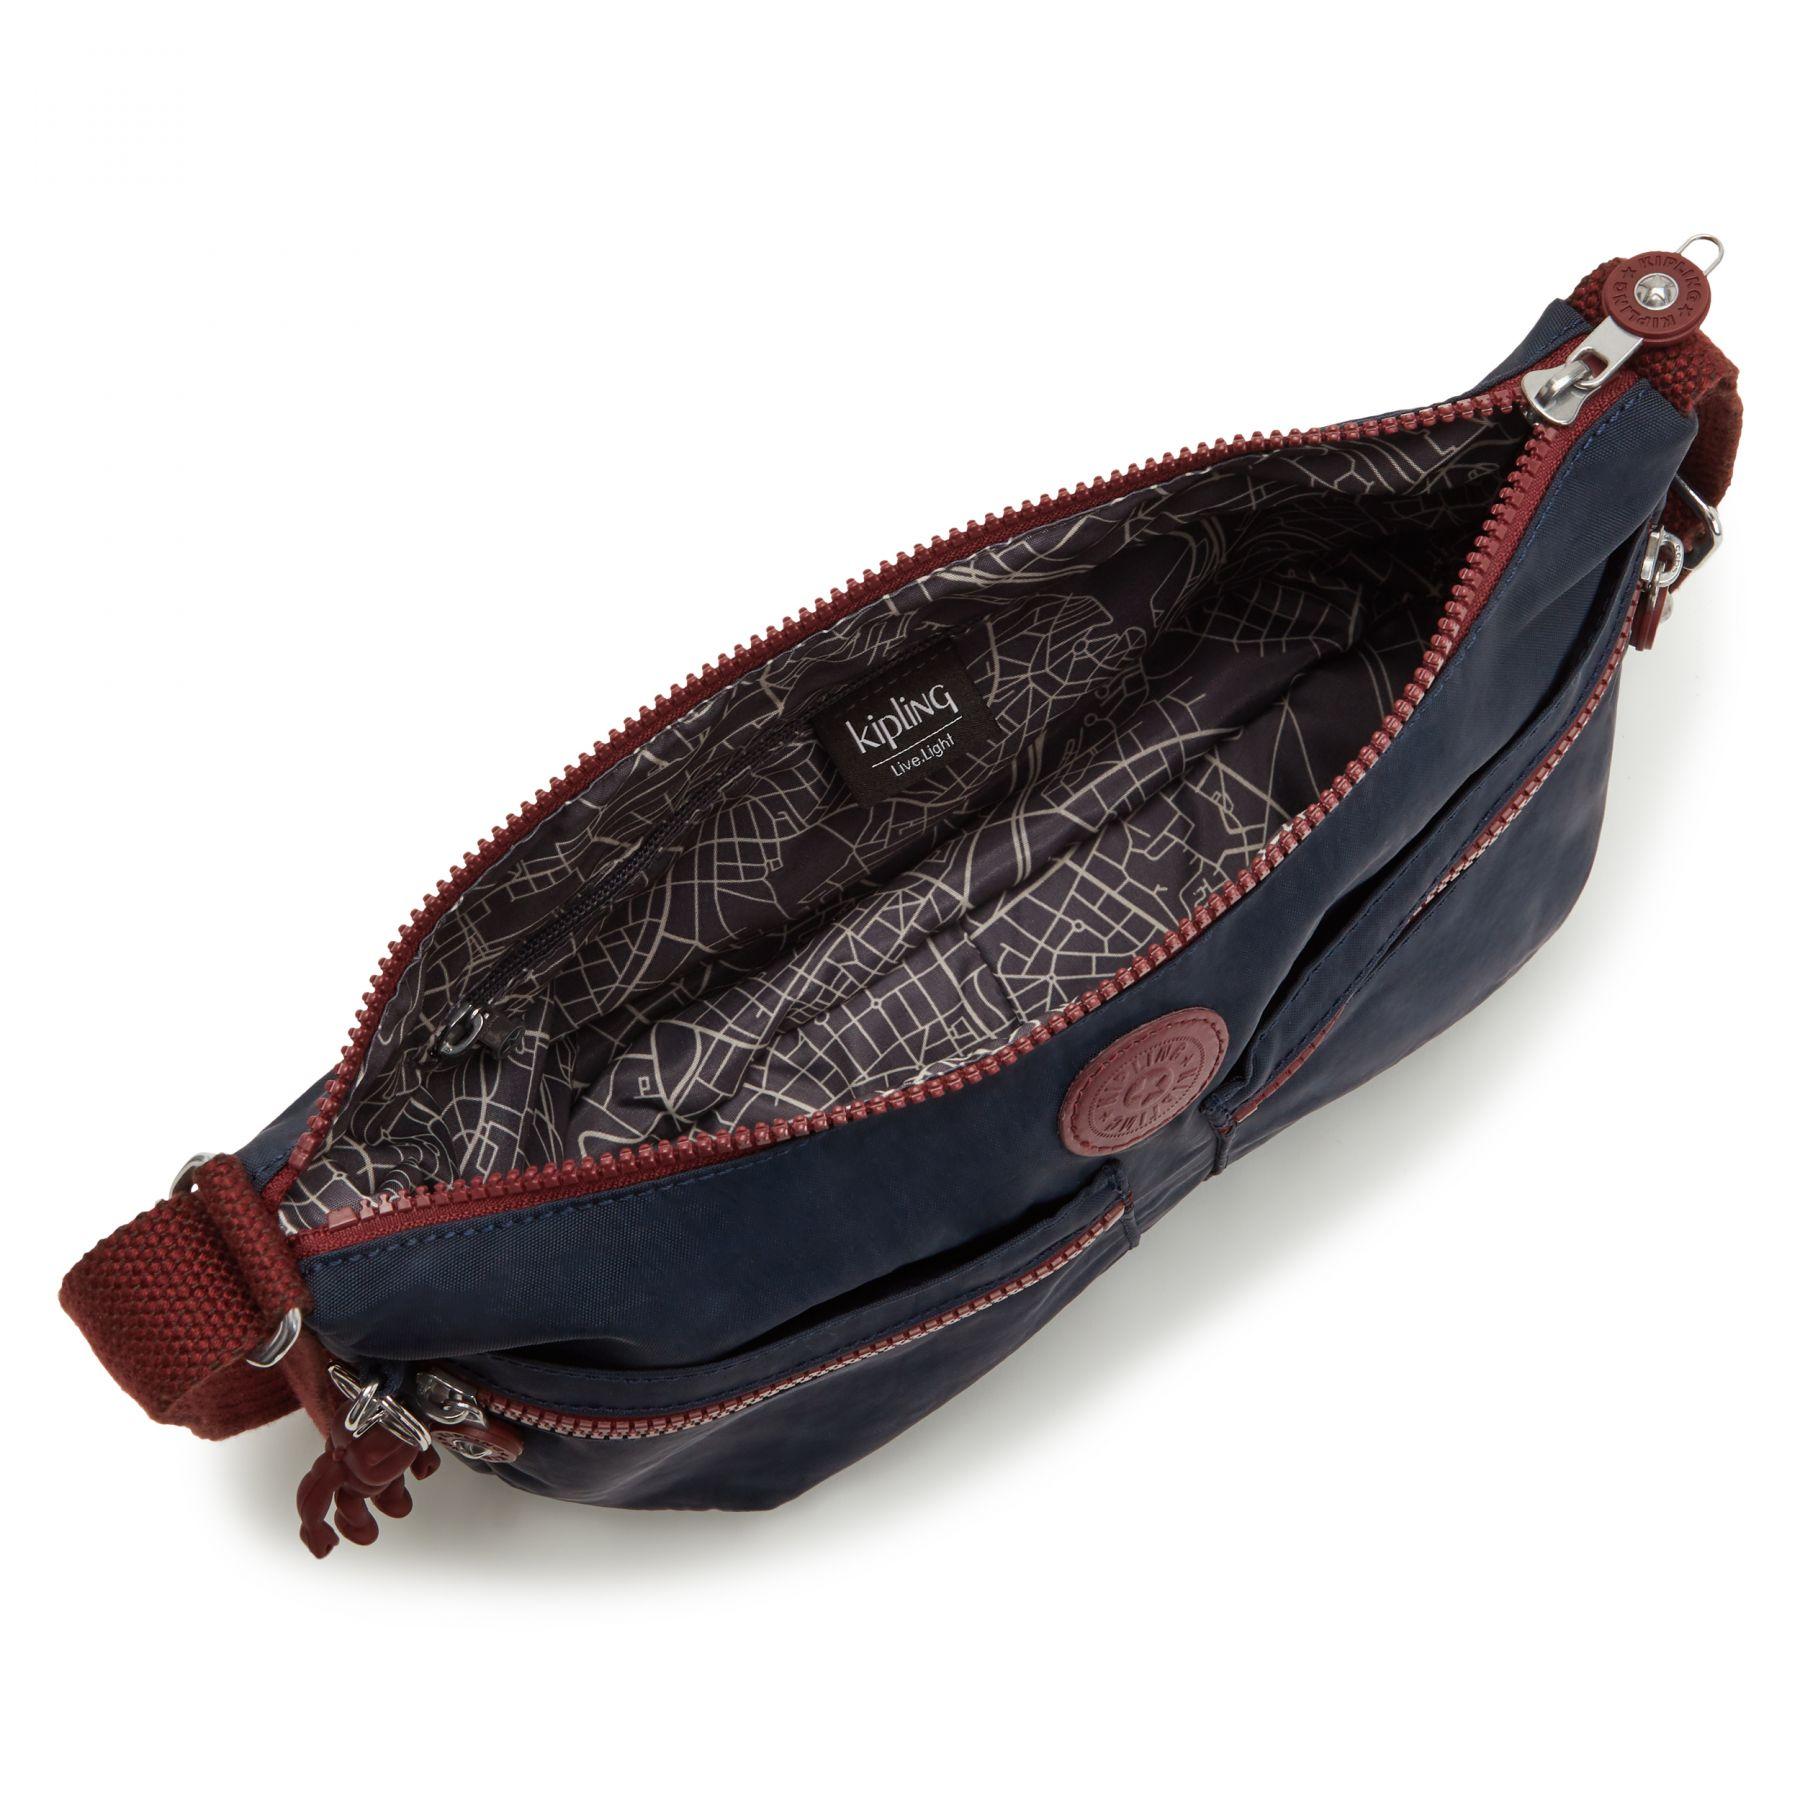 IZELLAH BAGS by Kipling - Inside view